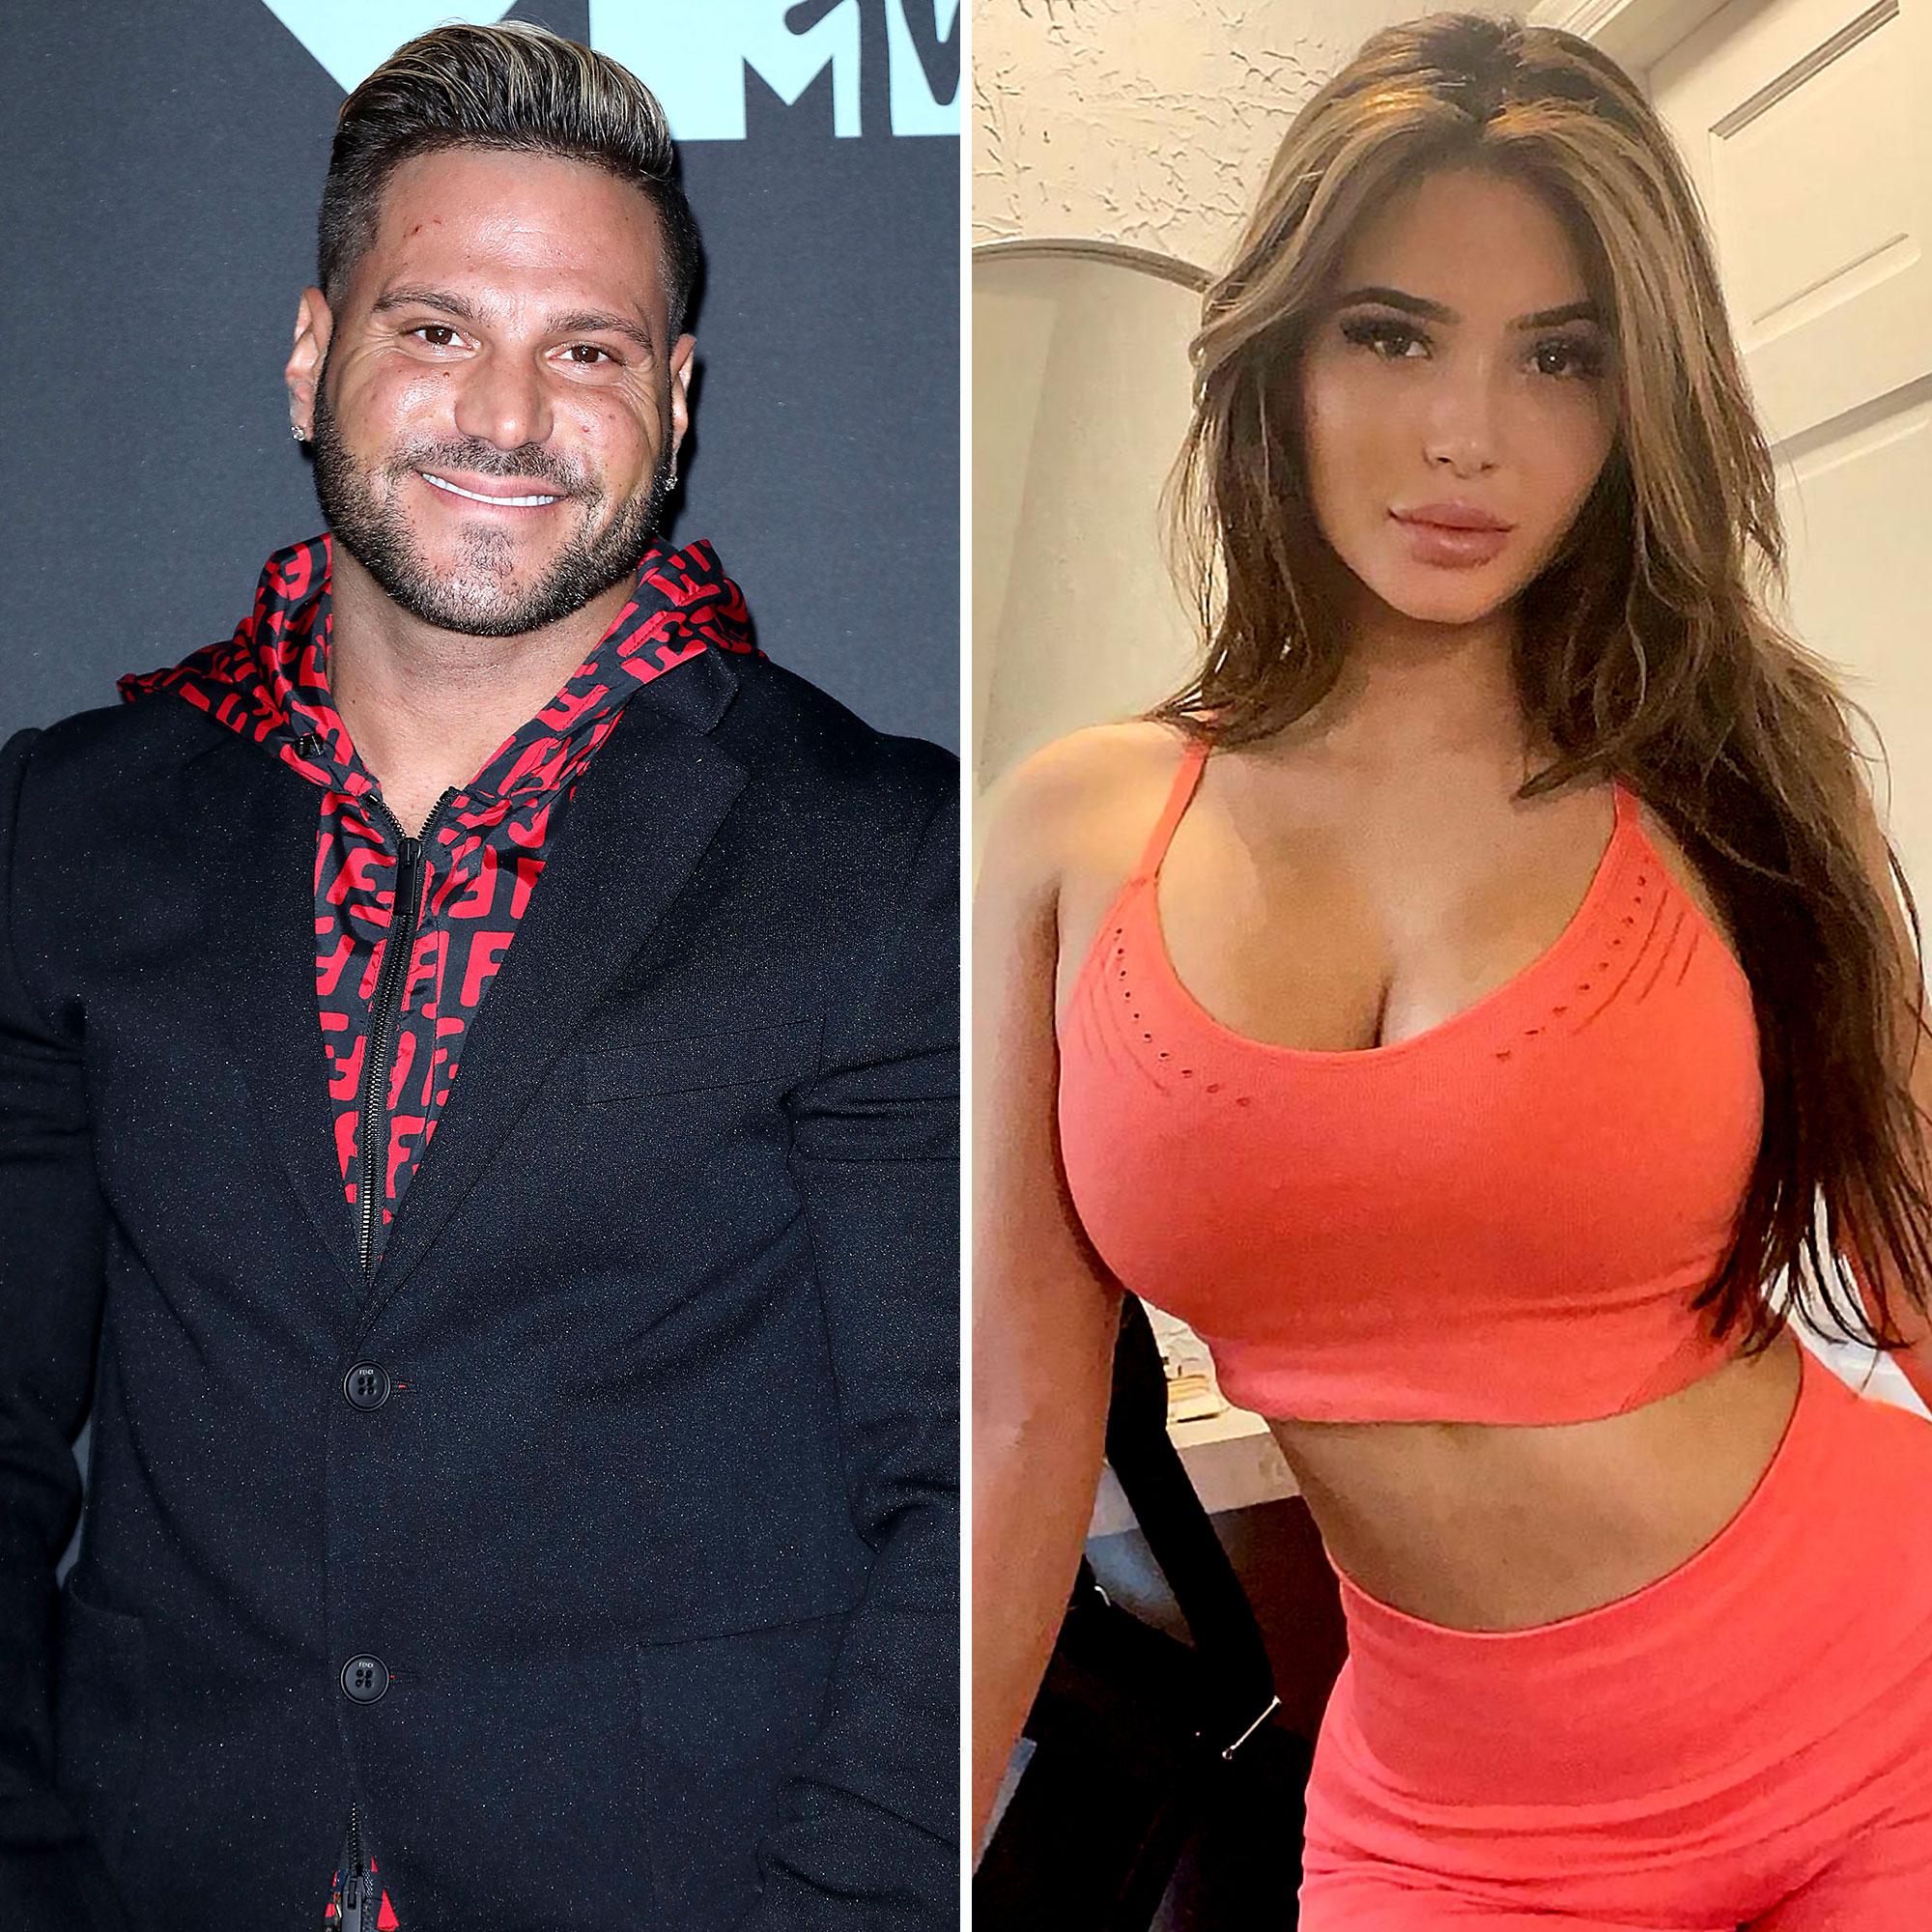 Ronnie Ortiz-Magro Hugs Girlfriend Saffire Matos 1 Month After Arrest